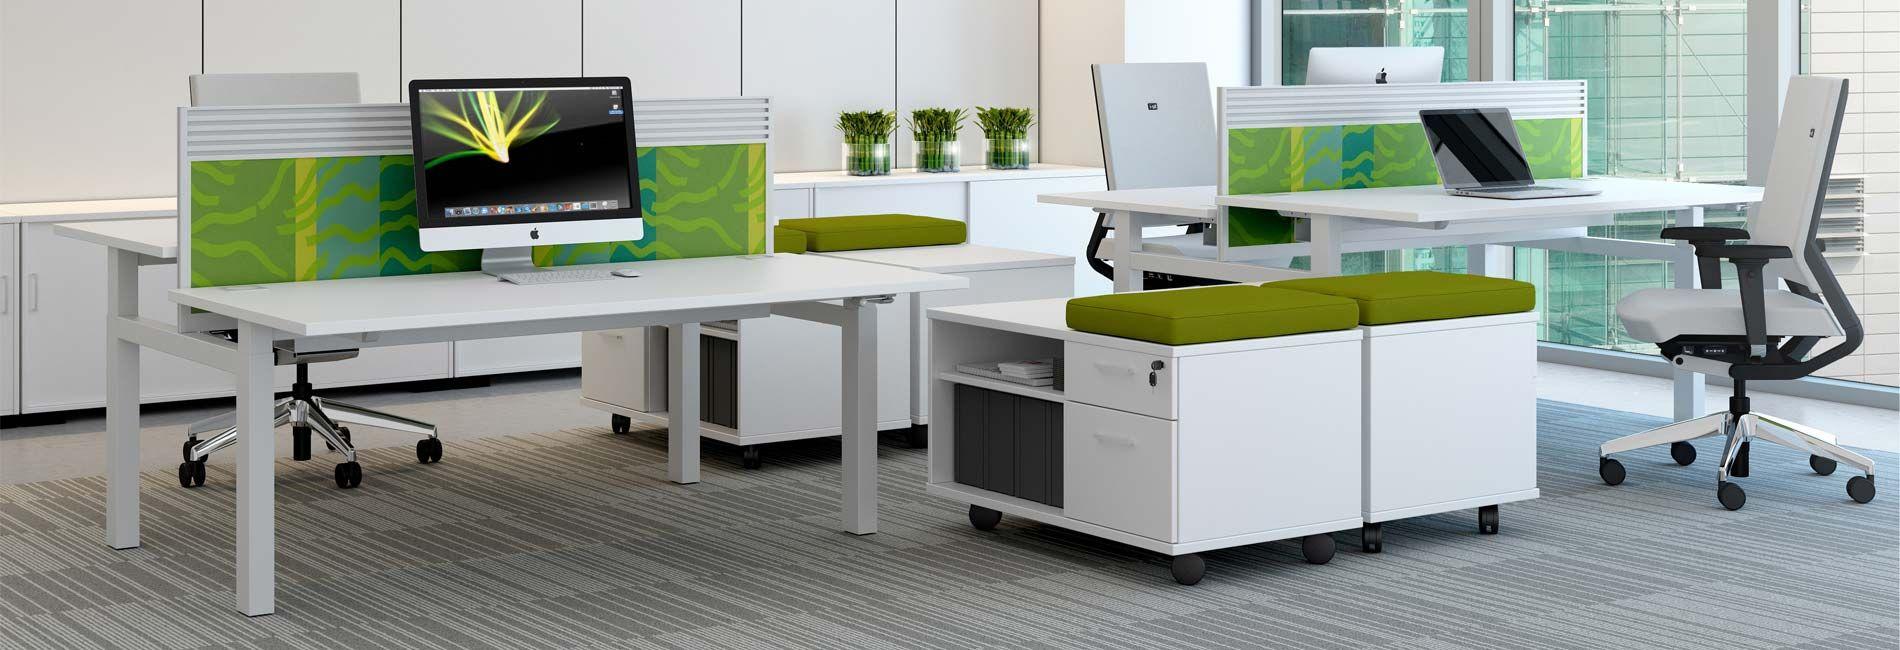 Büro Möbel Bilder Von Büromöbeln | BüroMöbel | Pinterest | Büromöbel ...